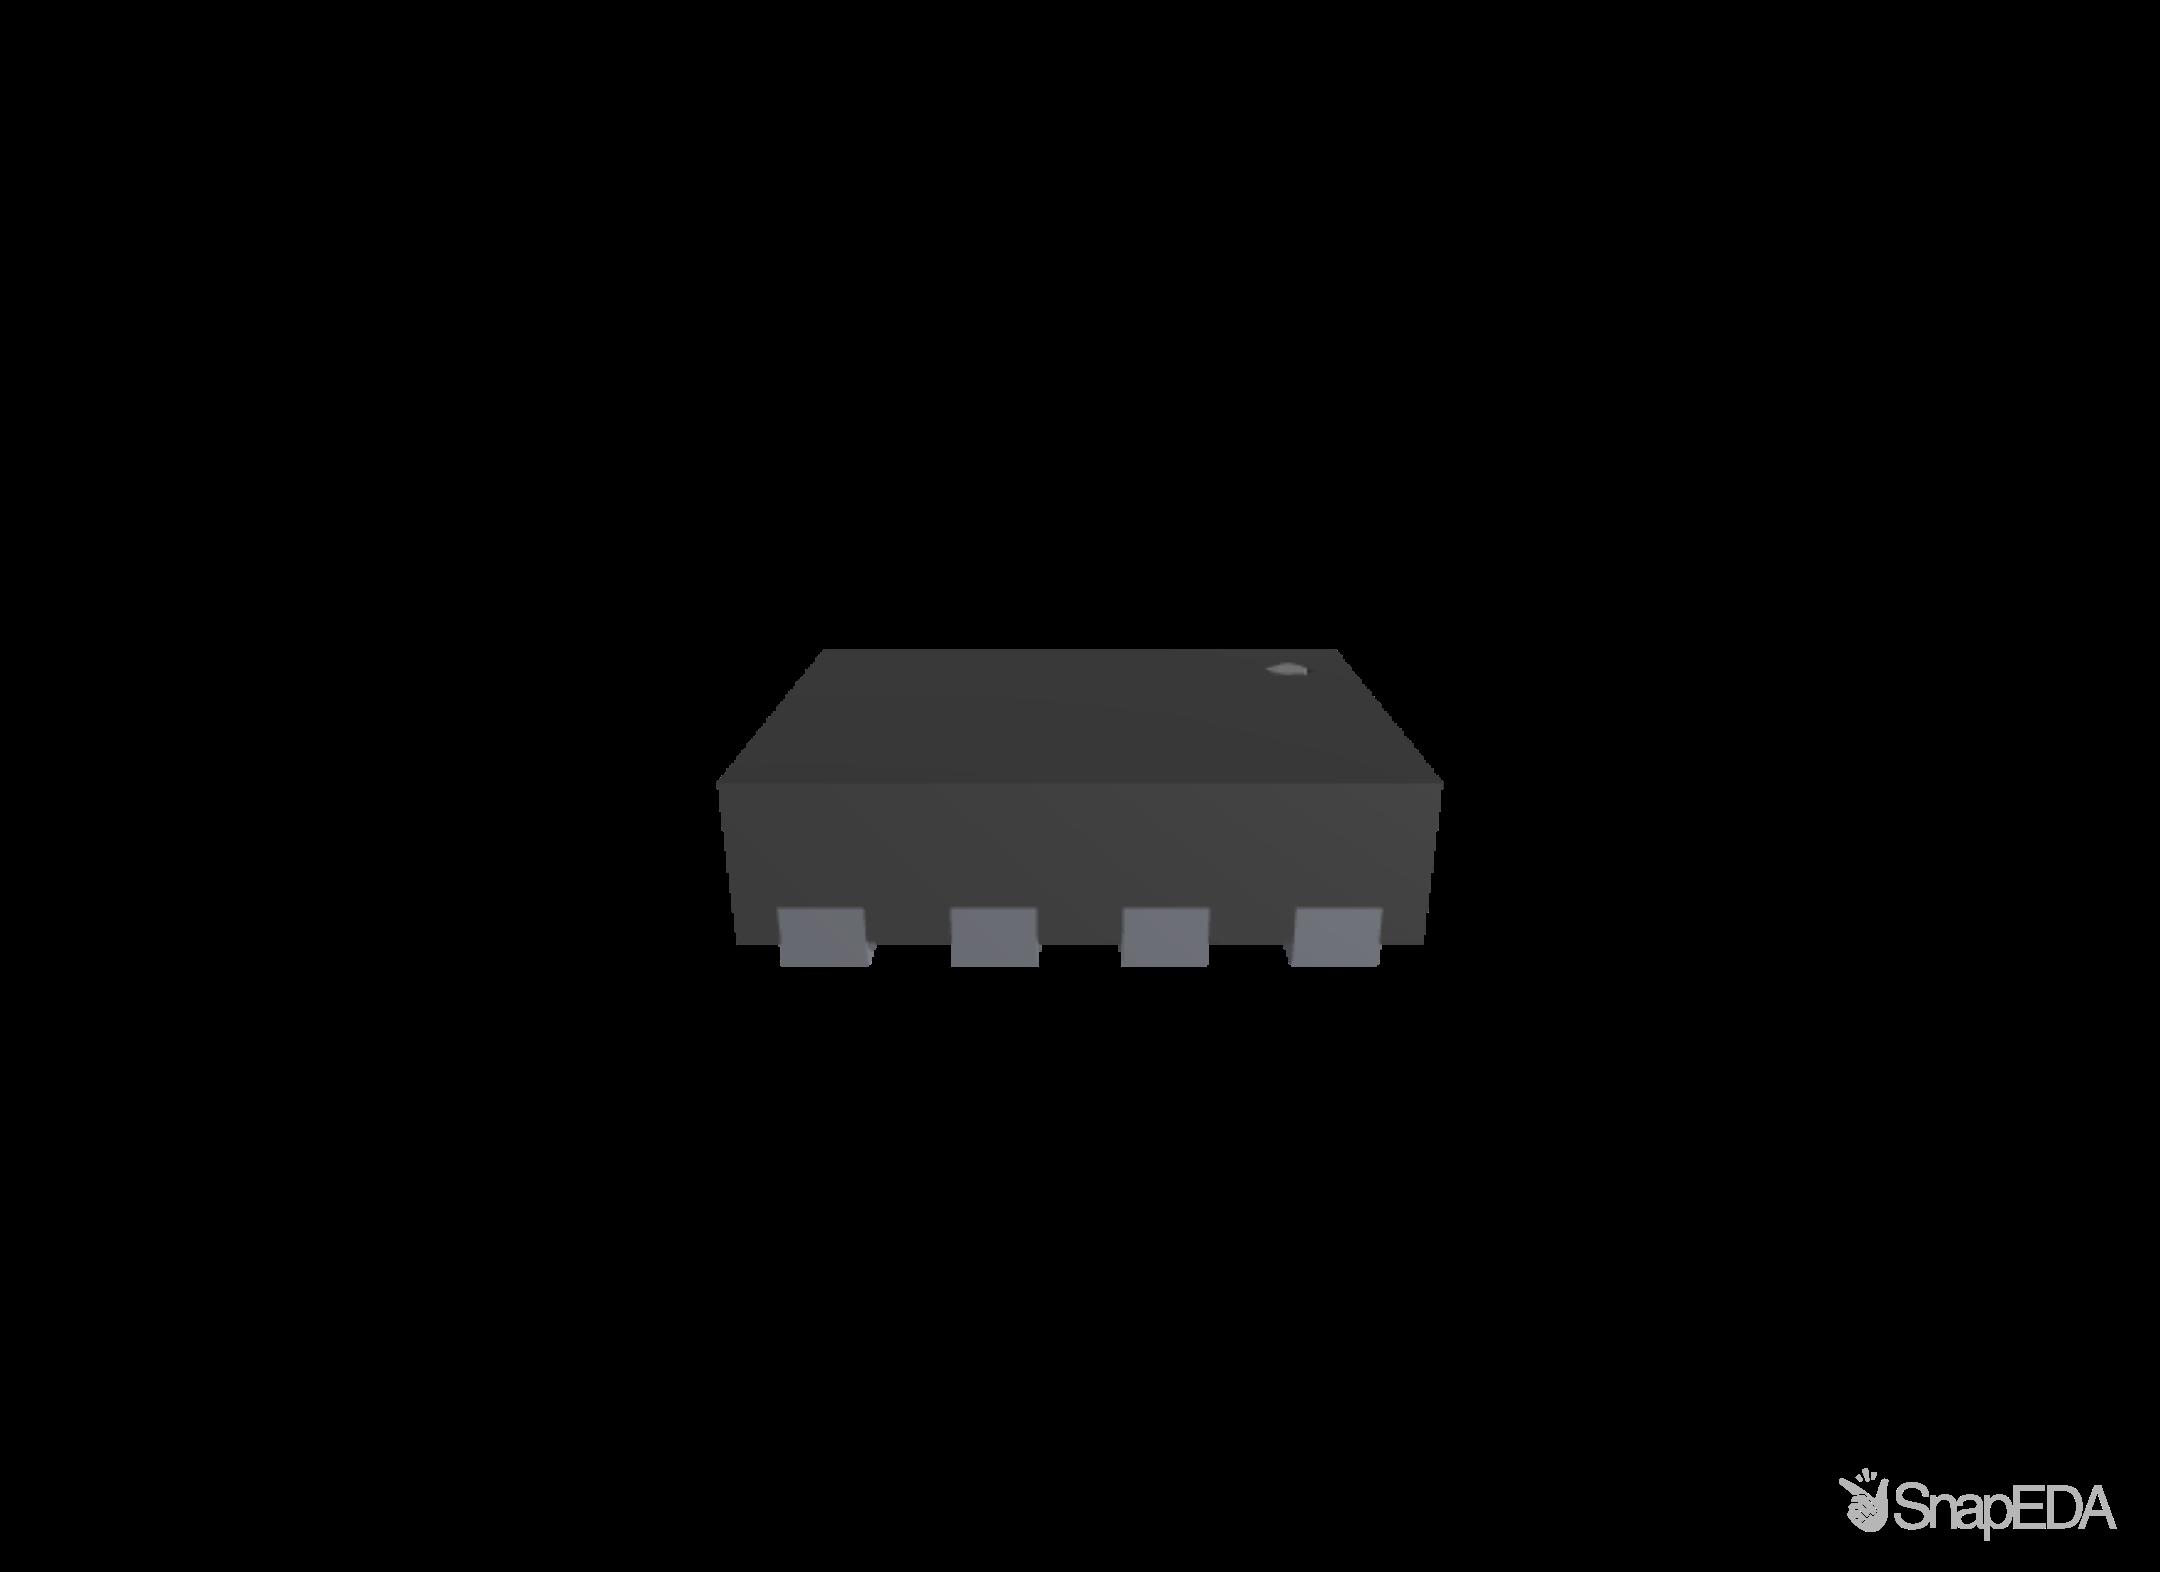 TXS0102DQER 3D Model